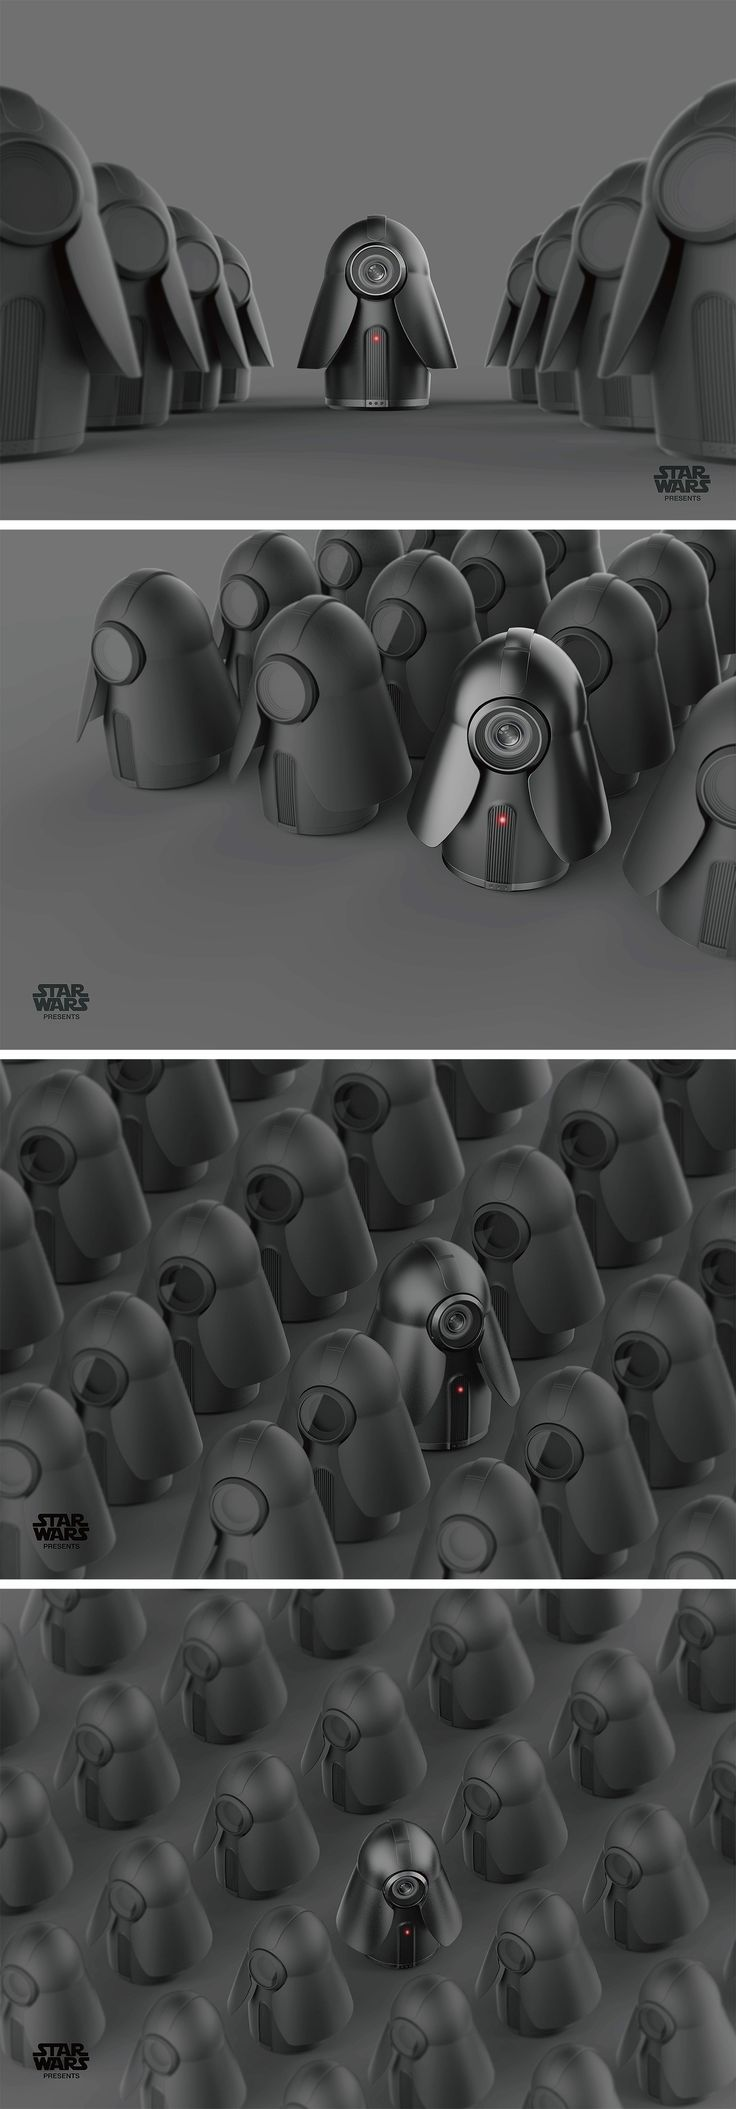 Product design / Industrial design / 제품디자인 / 산업디자인 /Industrial / STARWARZ / Darth Vader / Banner /design /